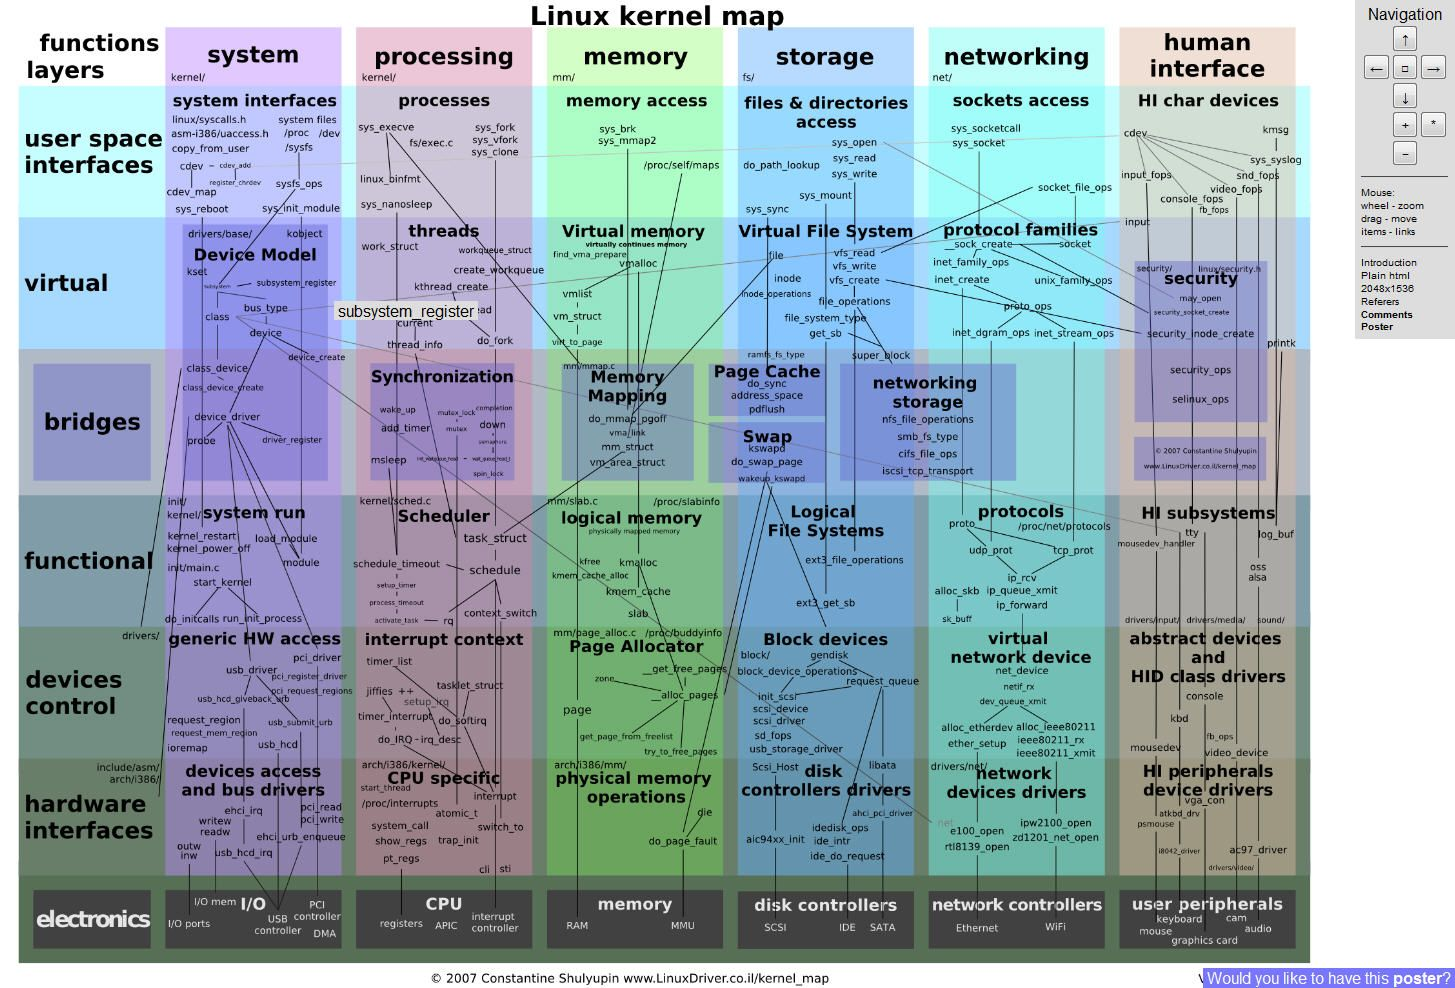 mapainteractivokernel